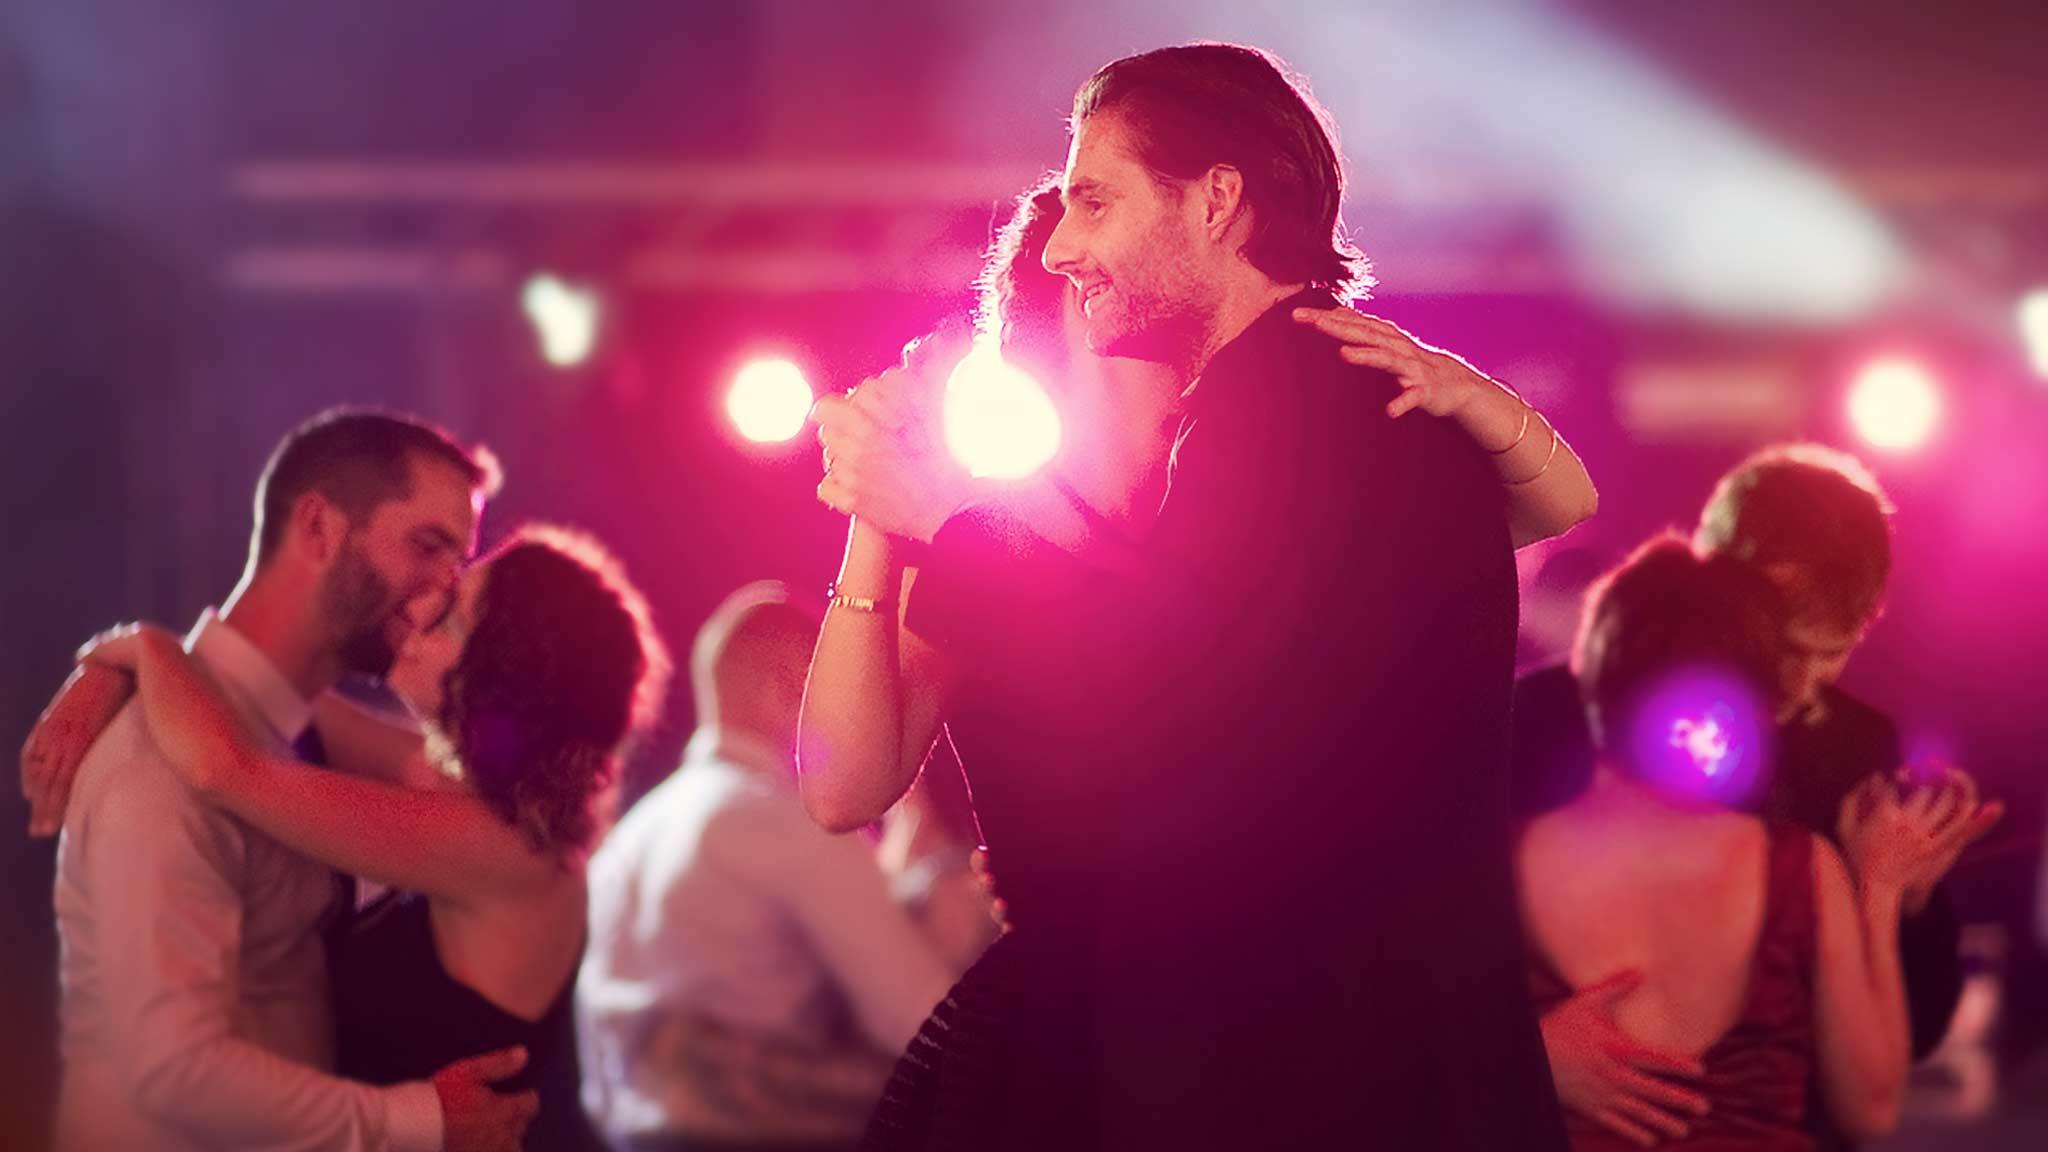 danse-lifestyle-soiree-evening-photographe-mariage-nancy-metz-wedding-photographer-party